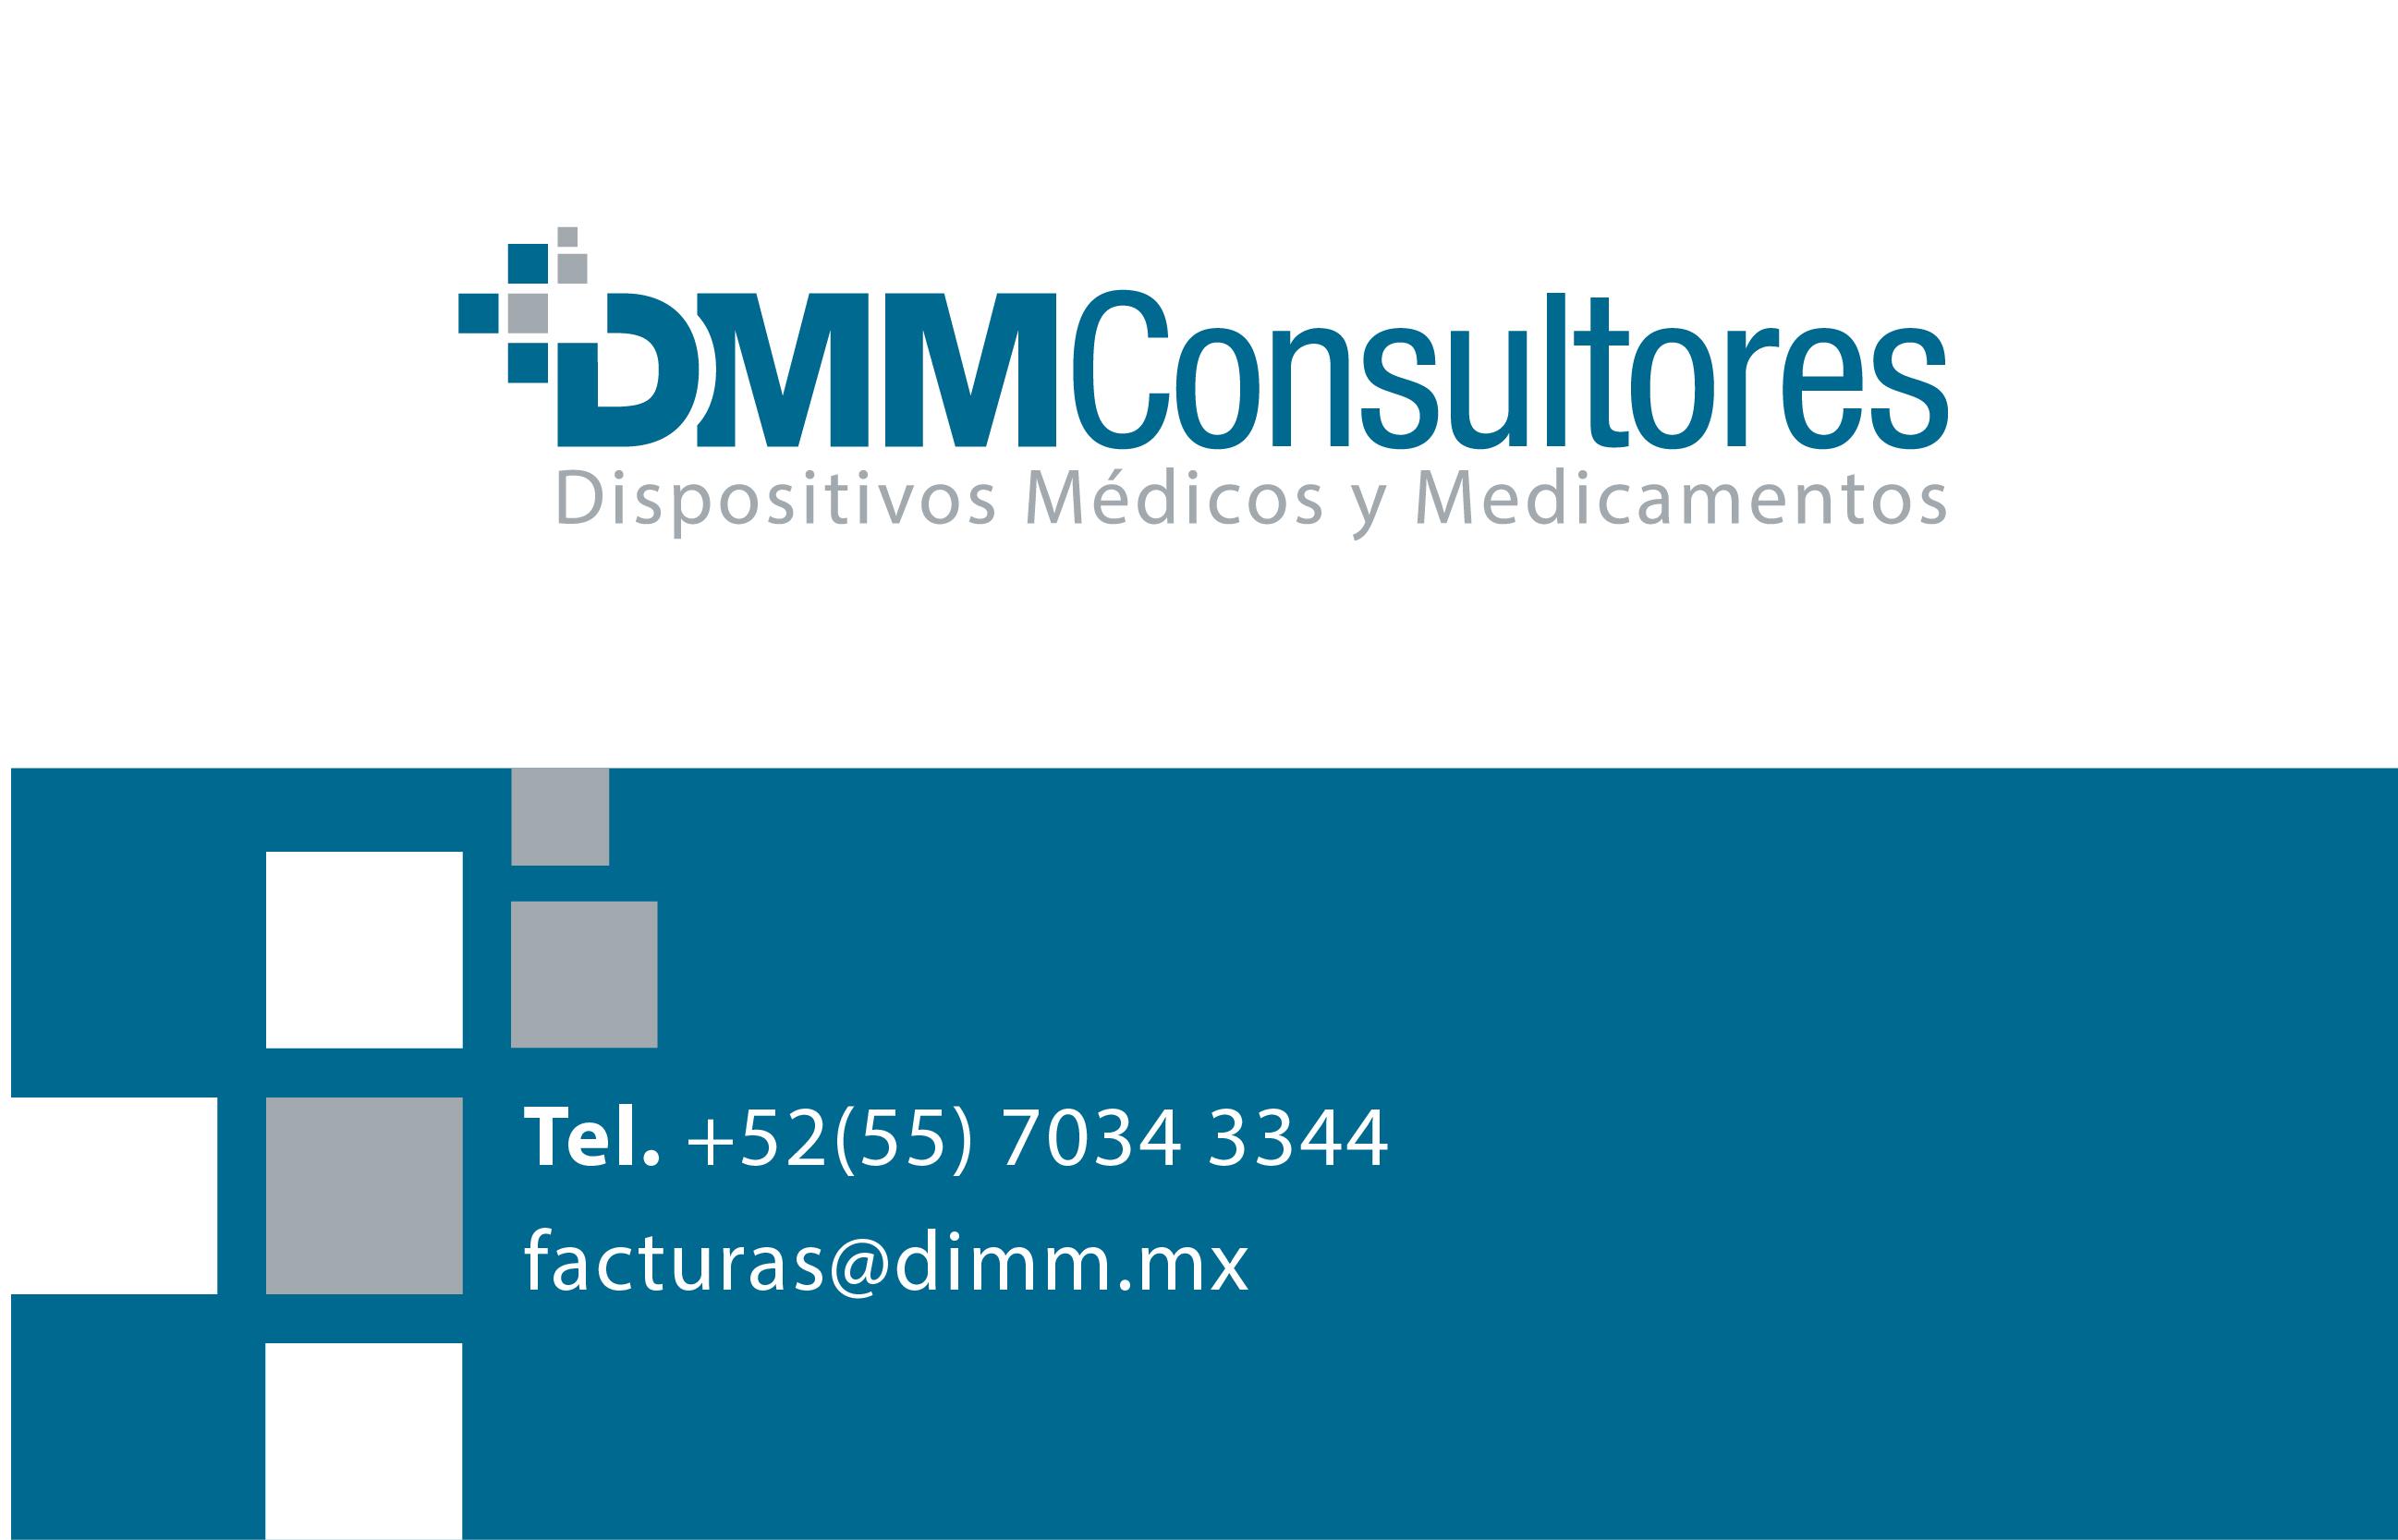 DMMConsultores_logo_620x400